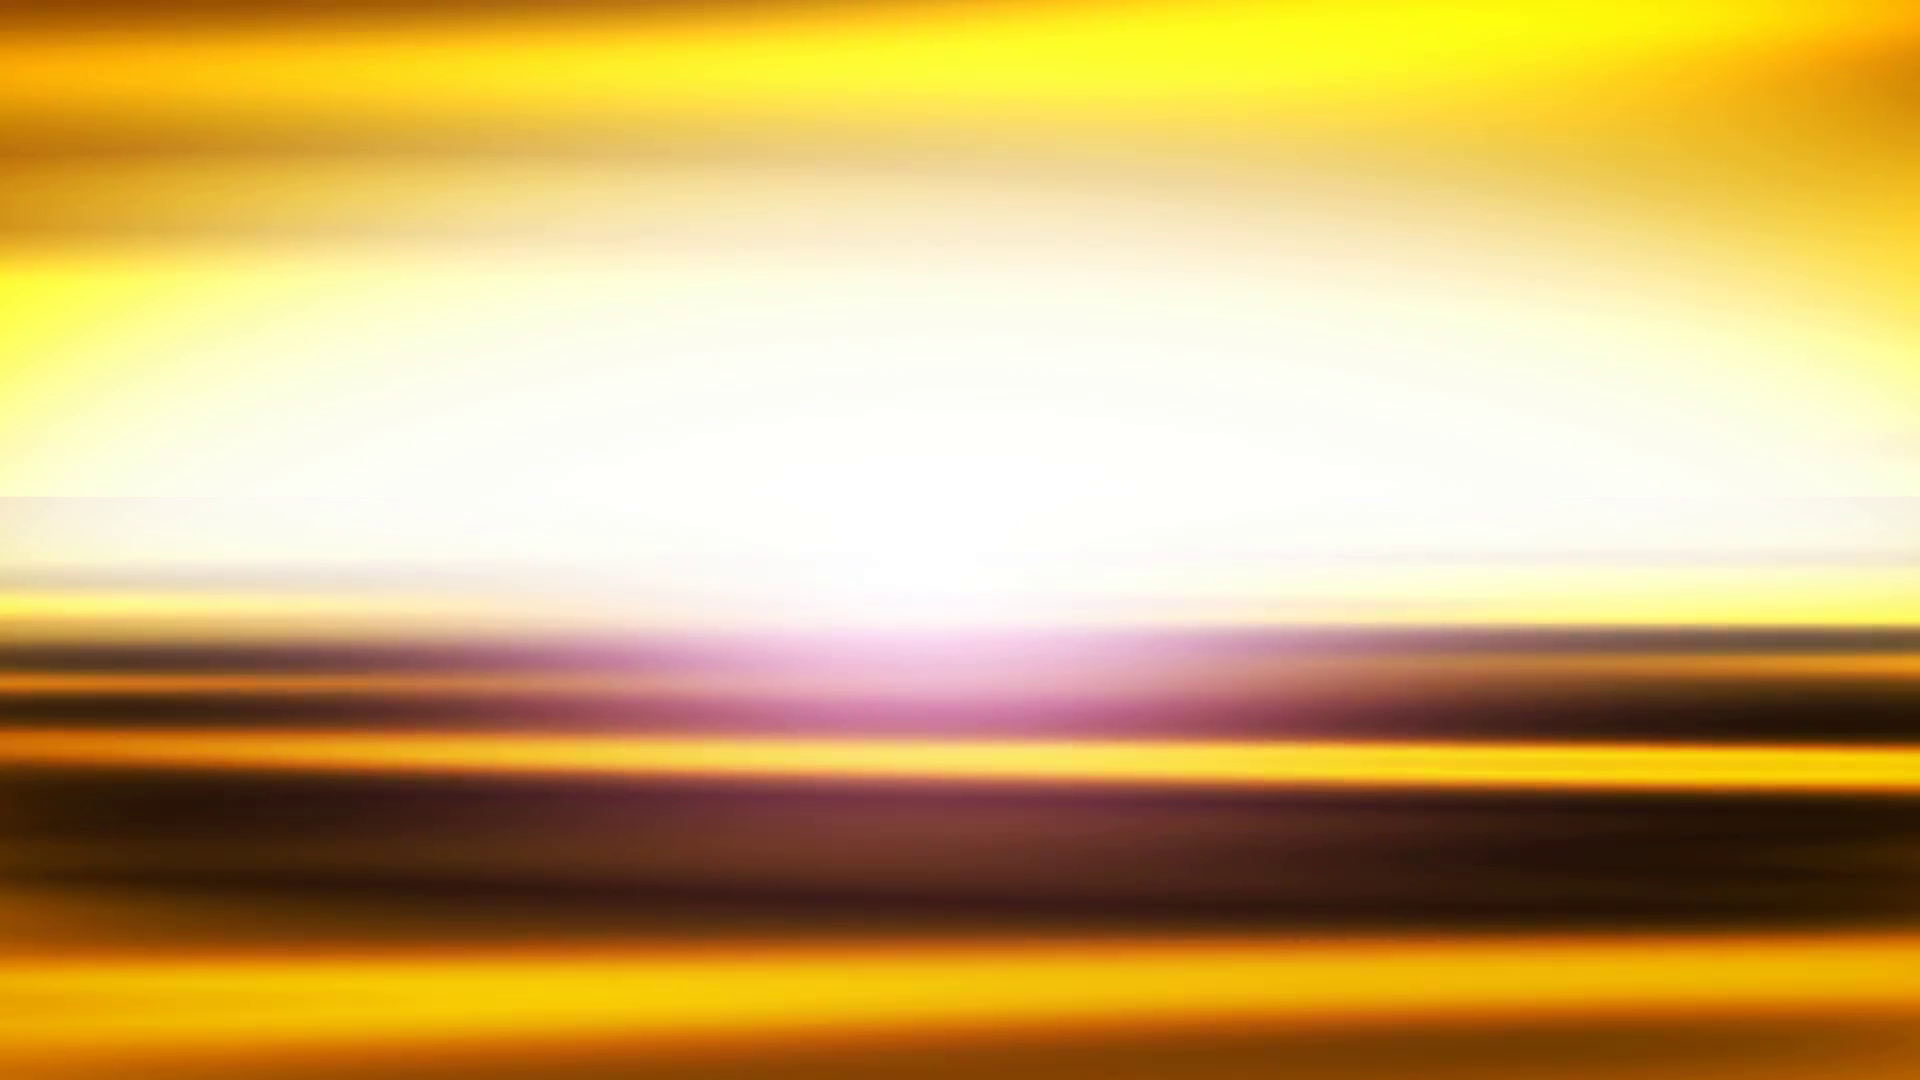 hot-rising-sun-background-or-ocean-blurred-landscape-interface_v1czxvfq__F0000